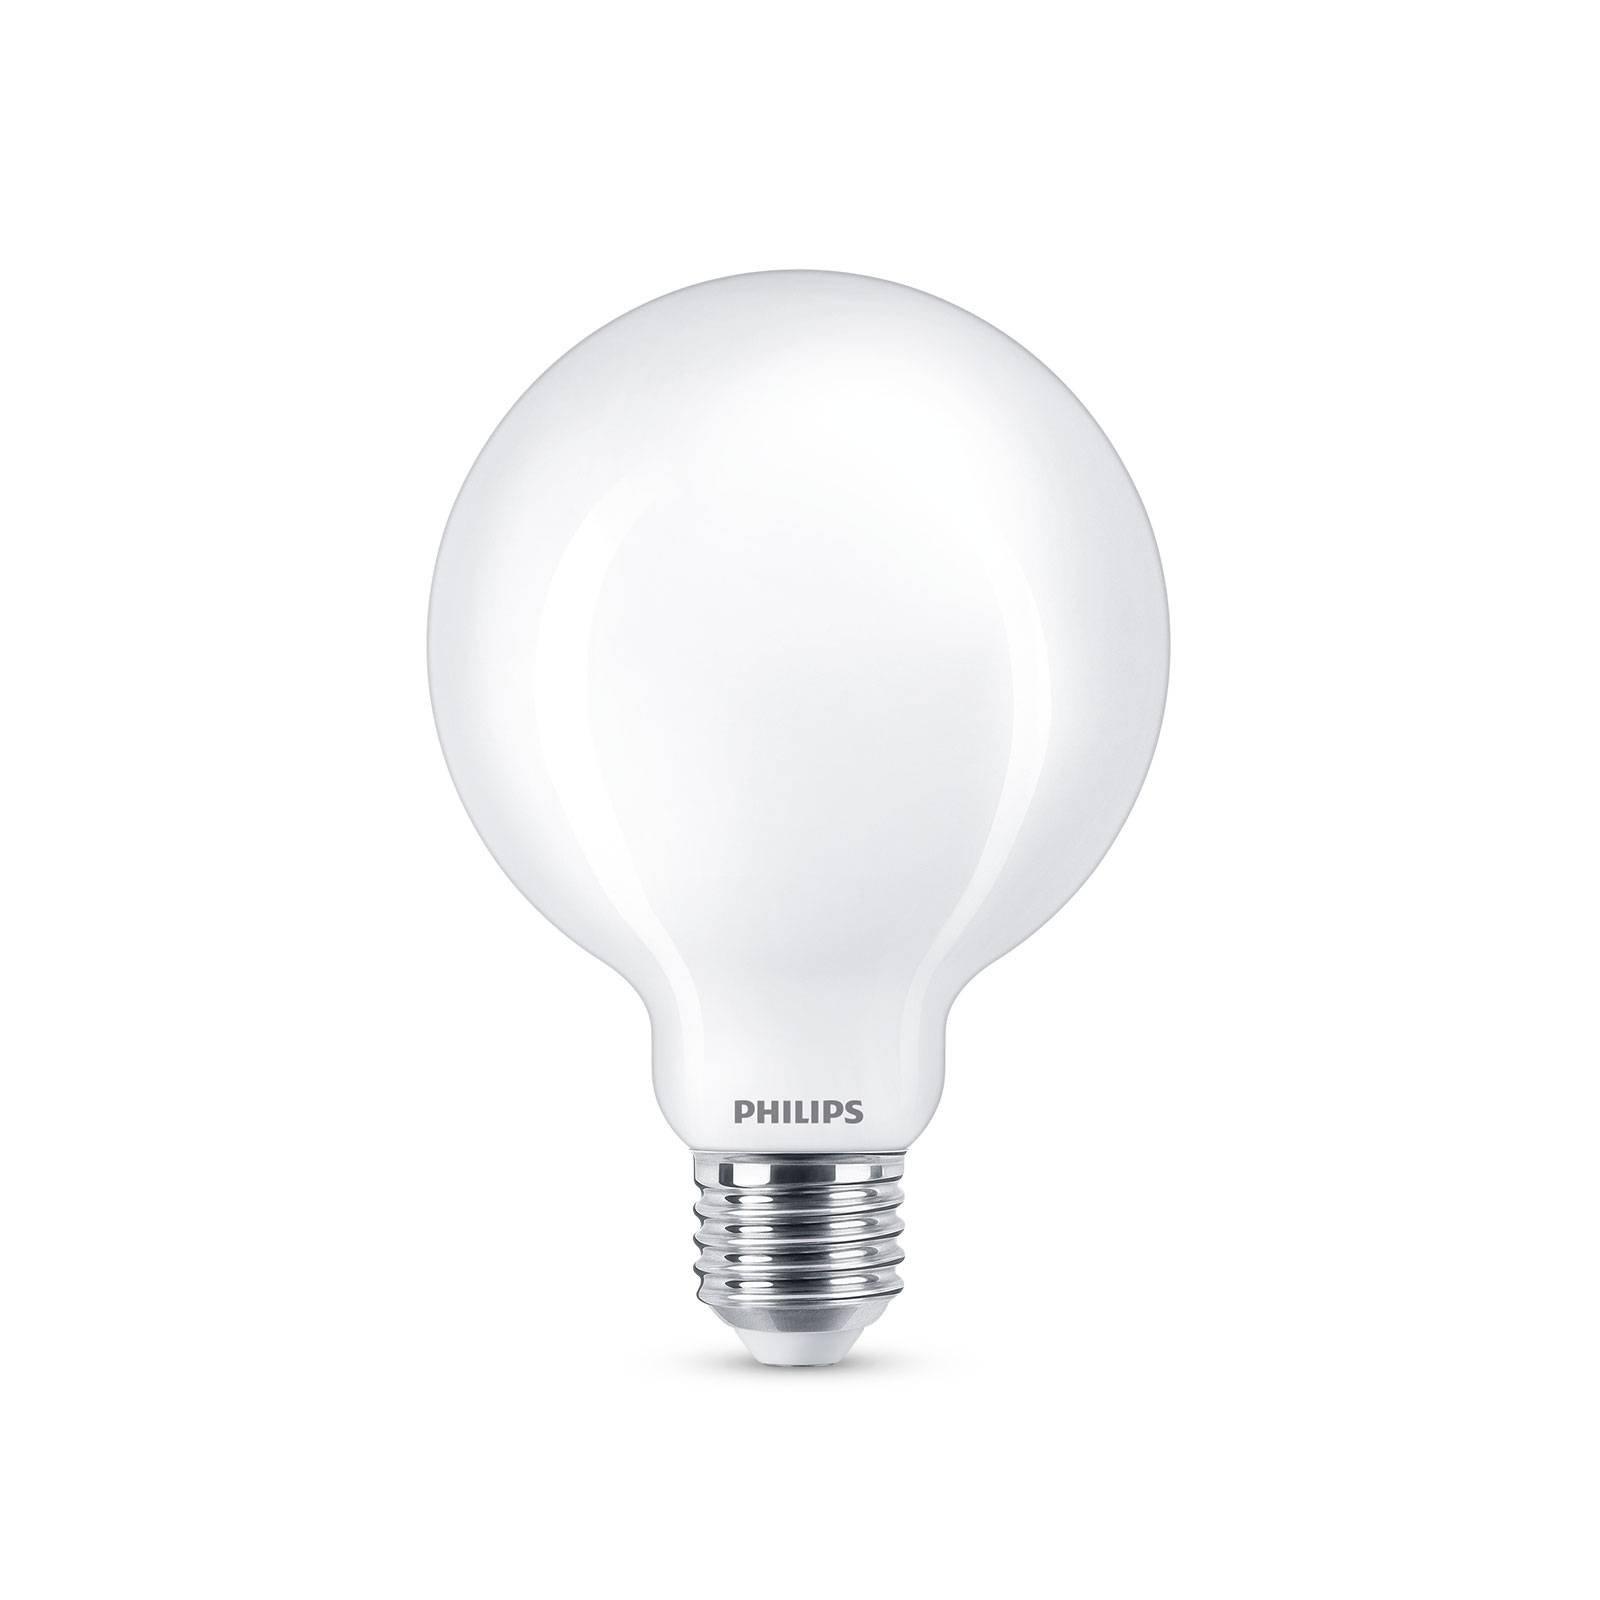 Philips LED-globepære E27 G93 7W 2 700 K, opal